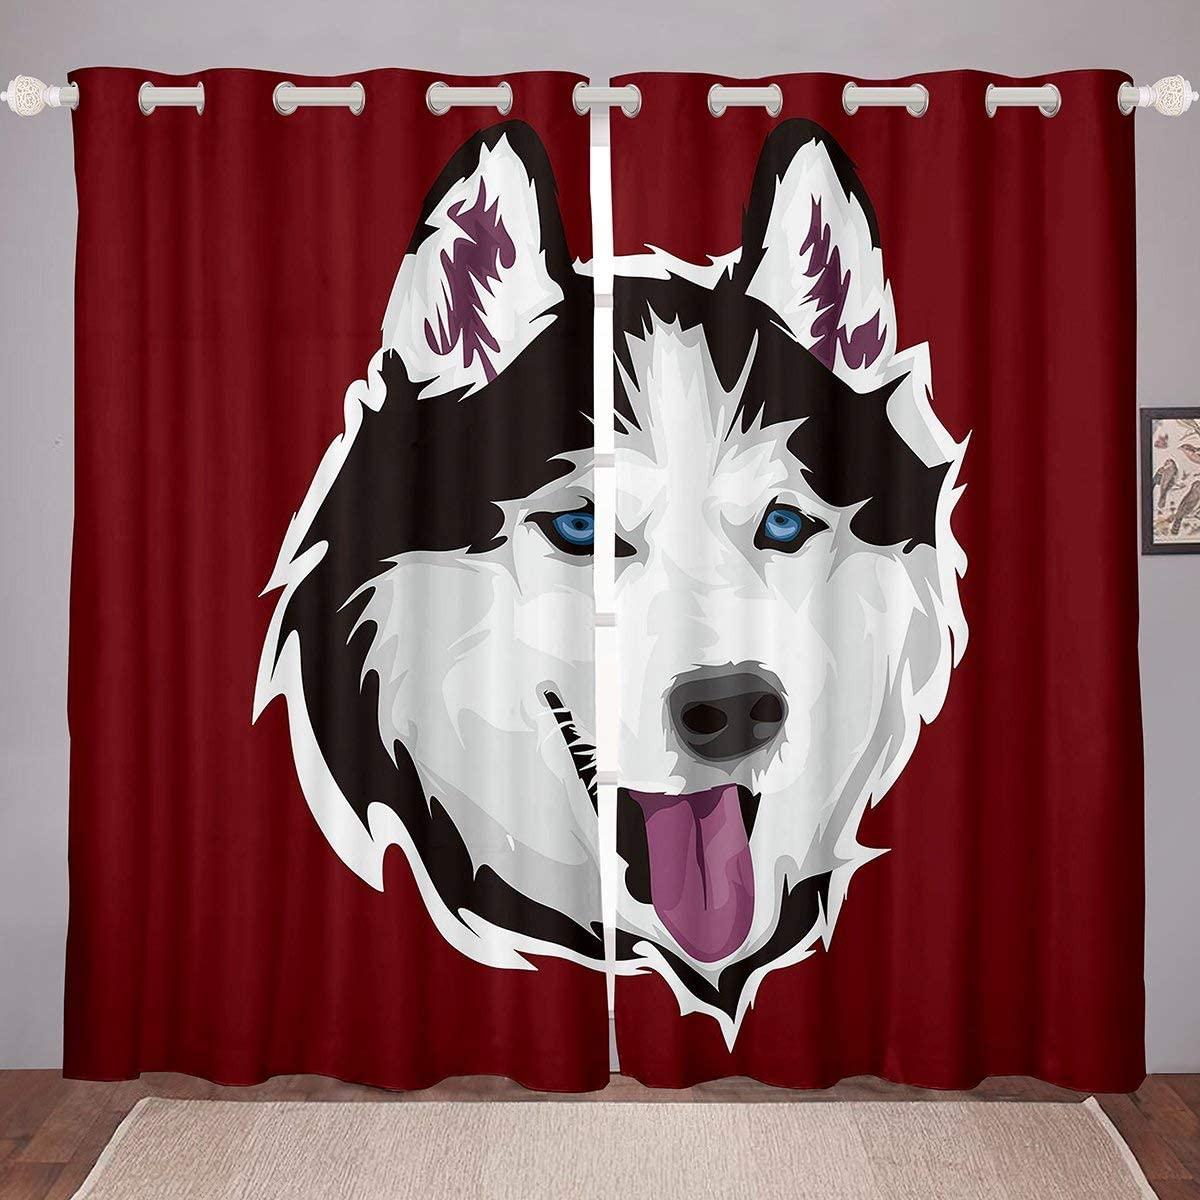 Erosebridal Husky Window Treatments for Kids Teens Adults, Puppy Pet Animal Window Drapes, Glitch Effect Window Curtains, Boys Girls Room Decor Dog Silhouette Curtain Panels 104W96L Black White Red